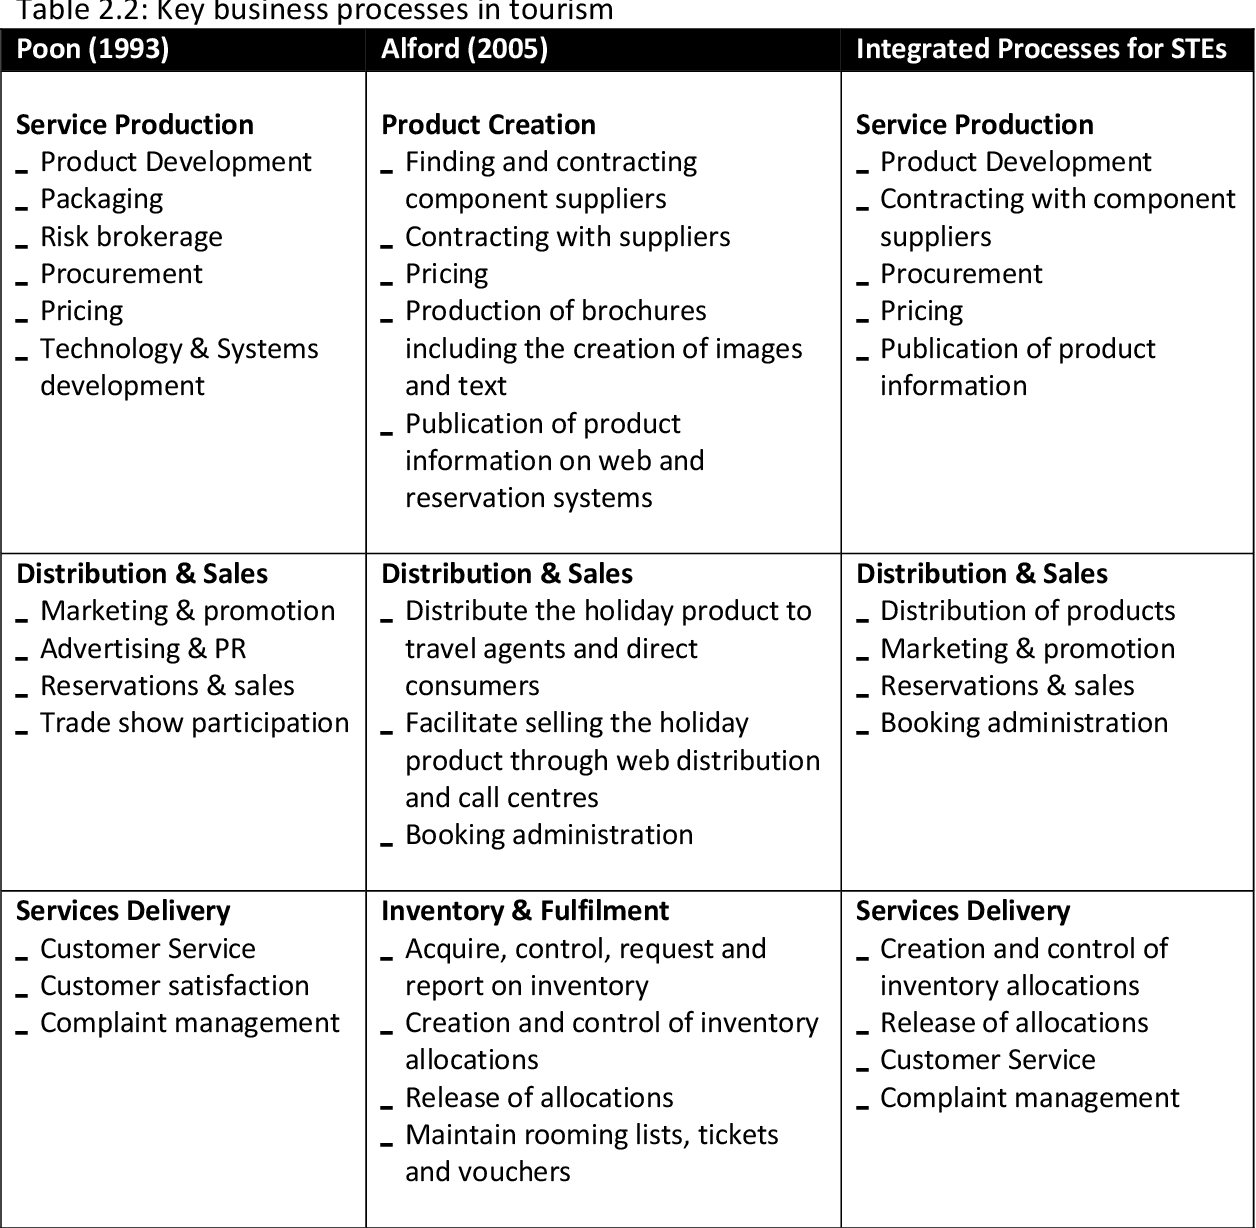 PDF] Business Value of ICT for Small Tourism Enterprises